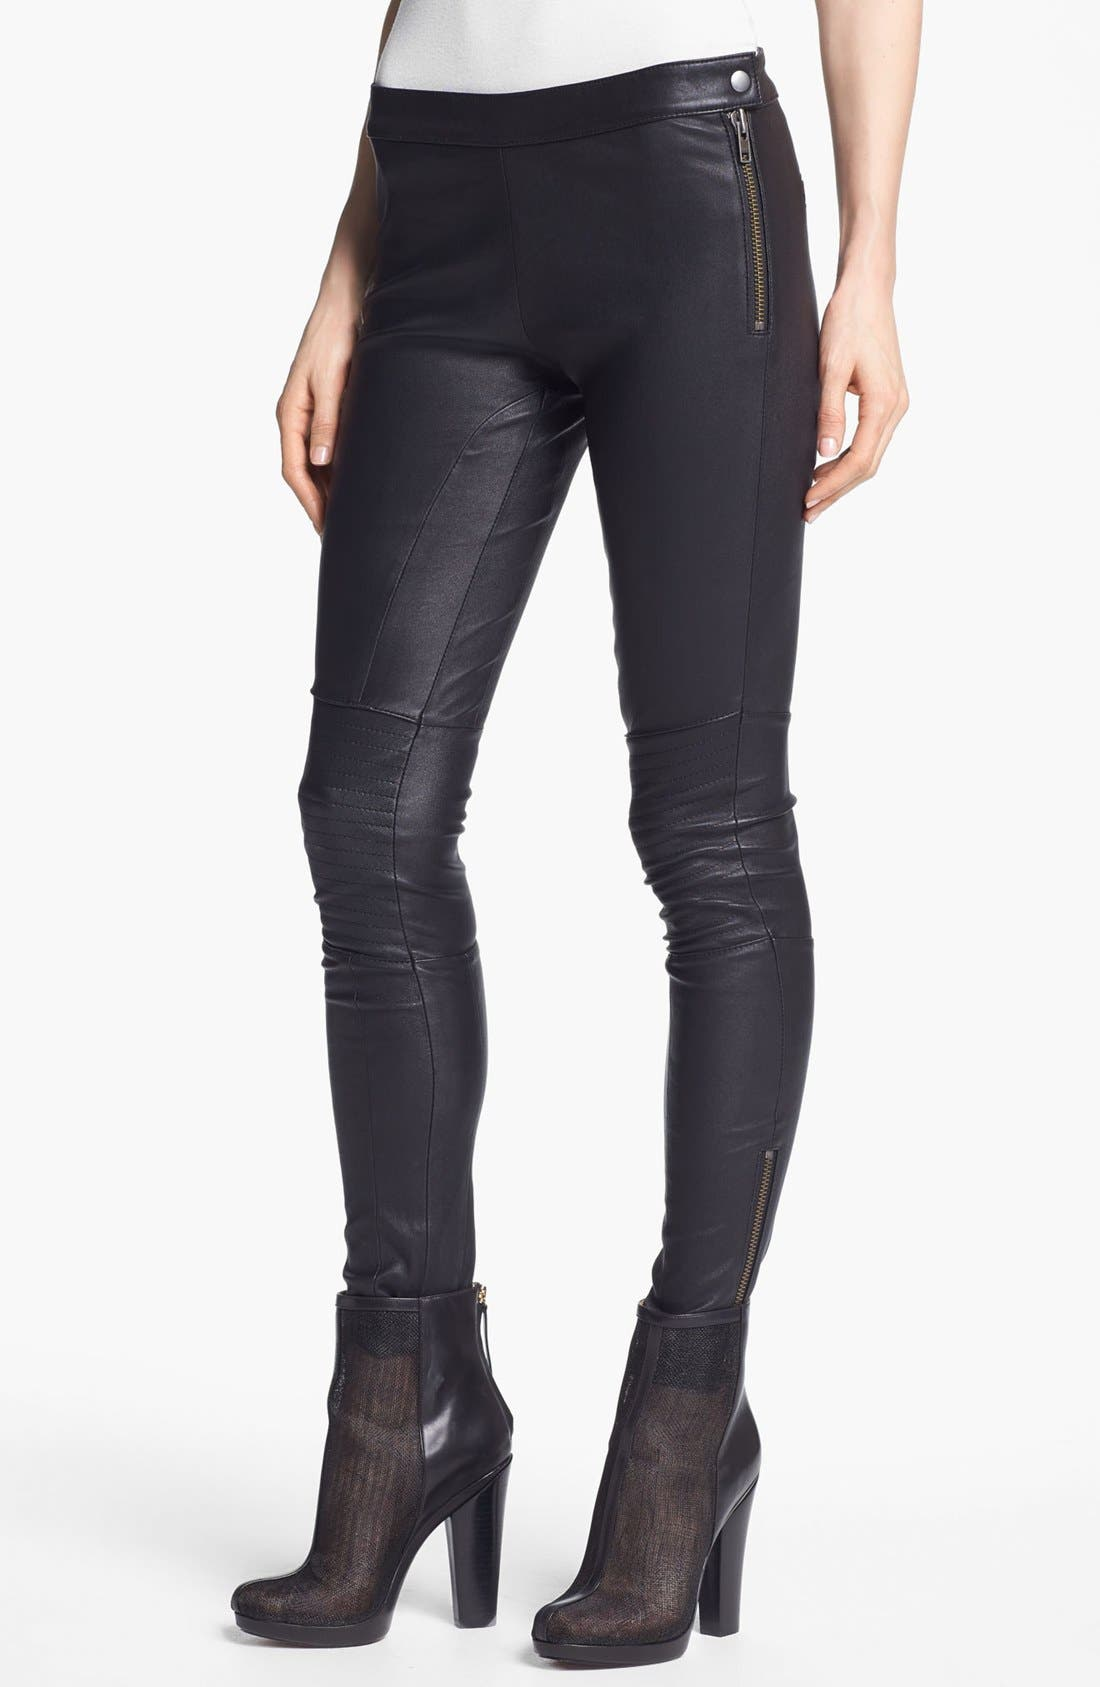 Alternate Image 1 Selected - Rachel Zoe 'Maxine' Skinny Stretch Leather Pants